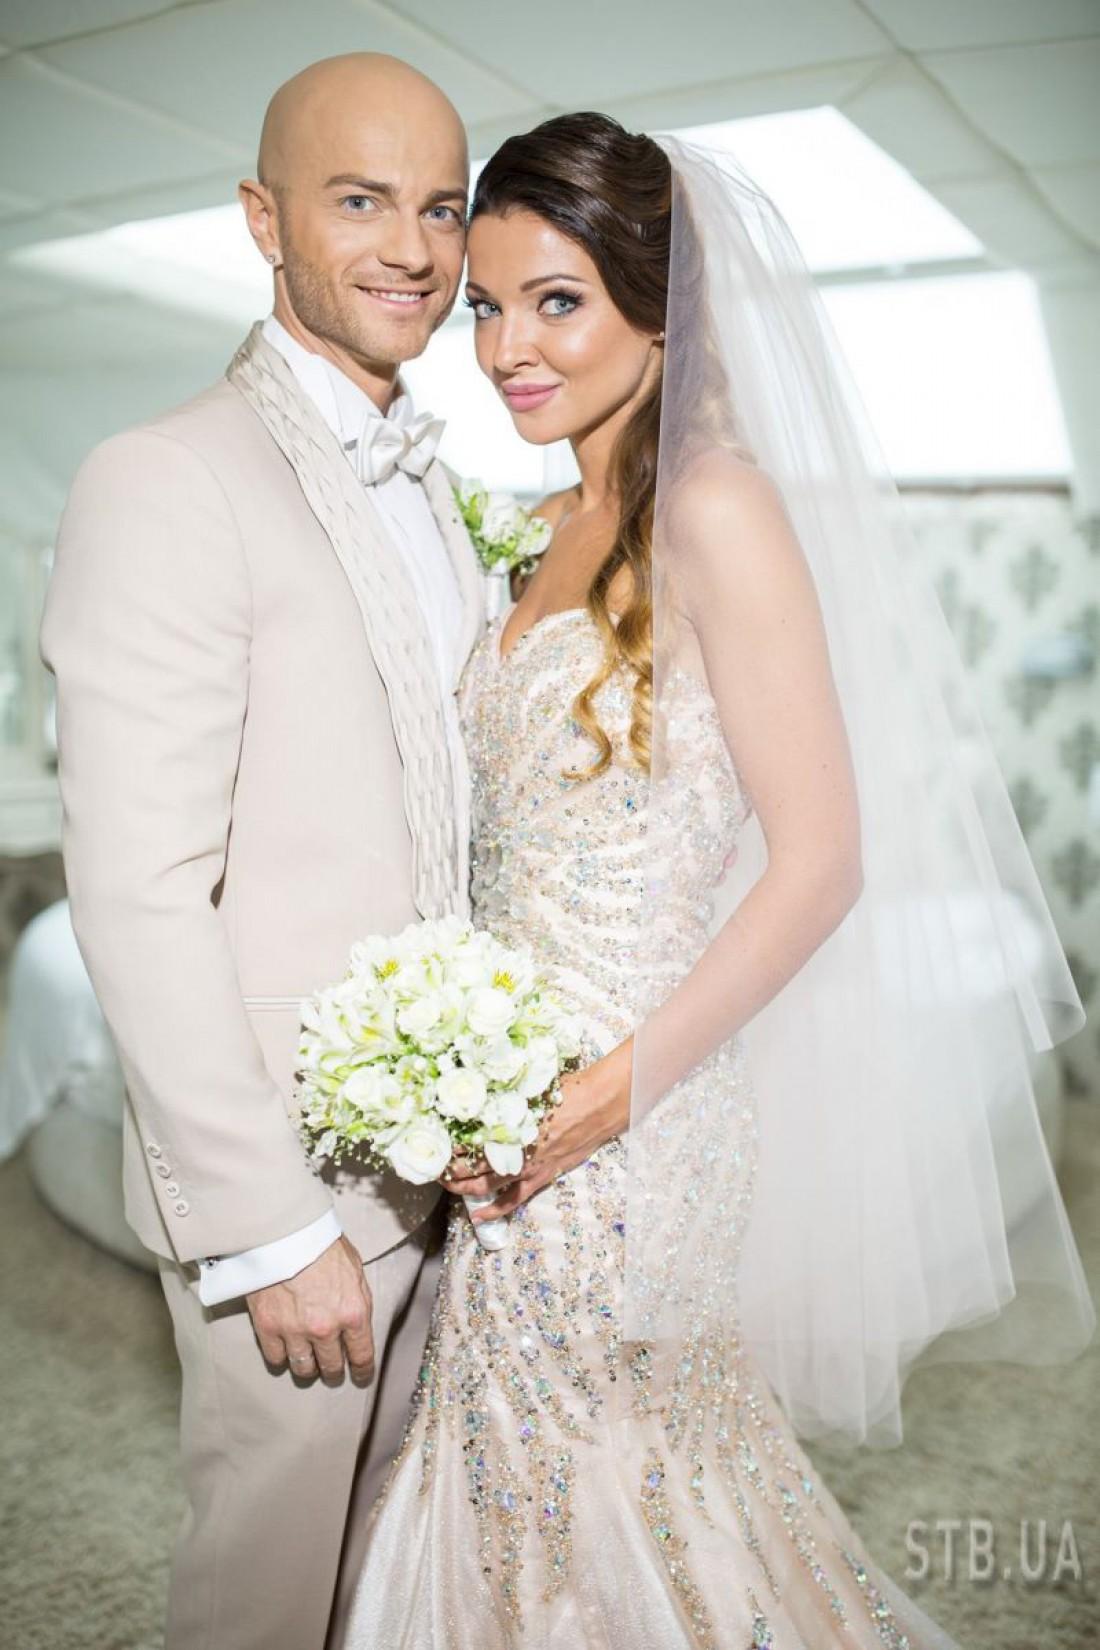 Влад Яма с супругой